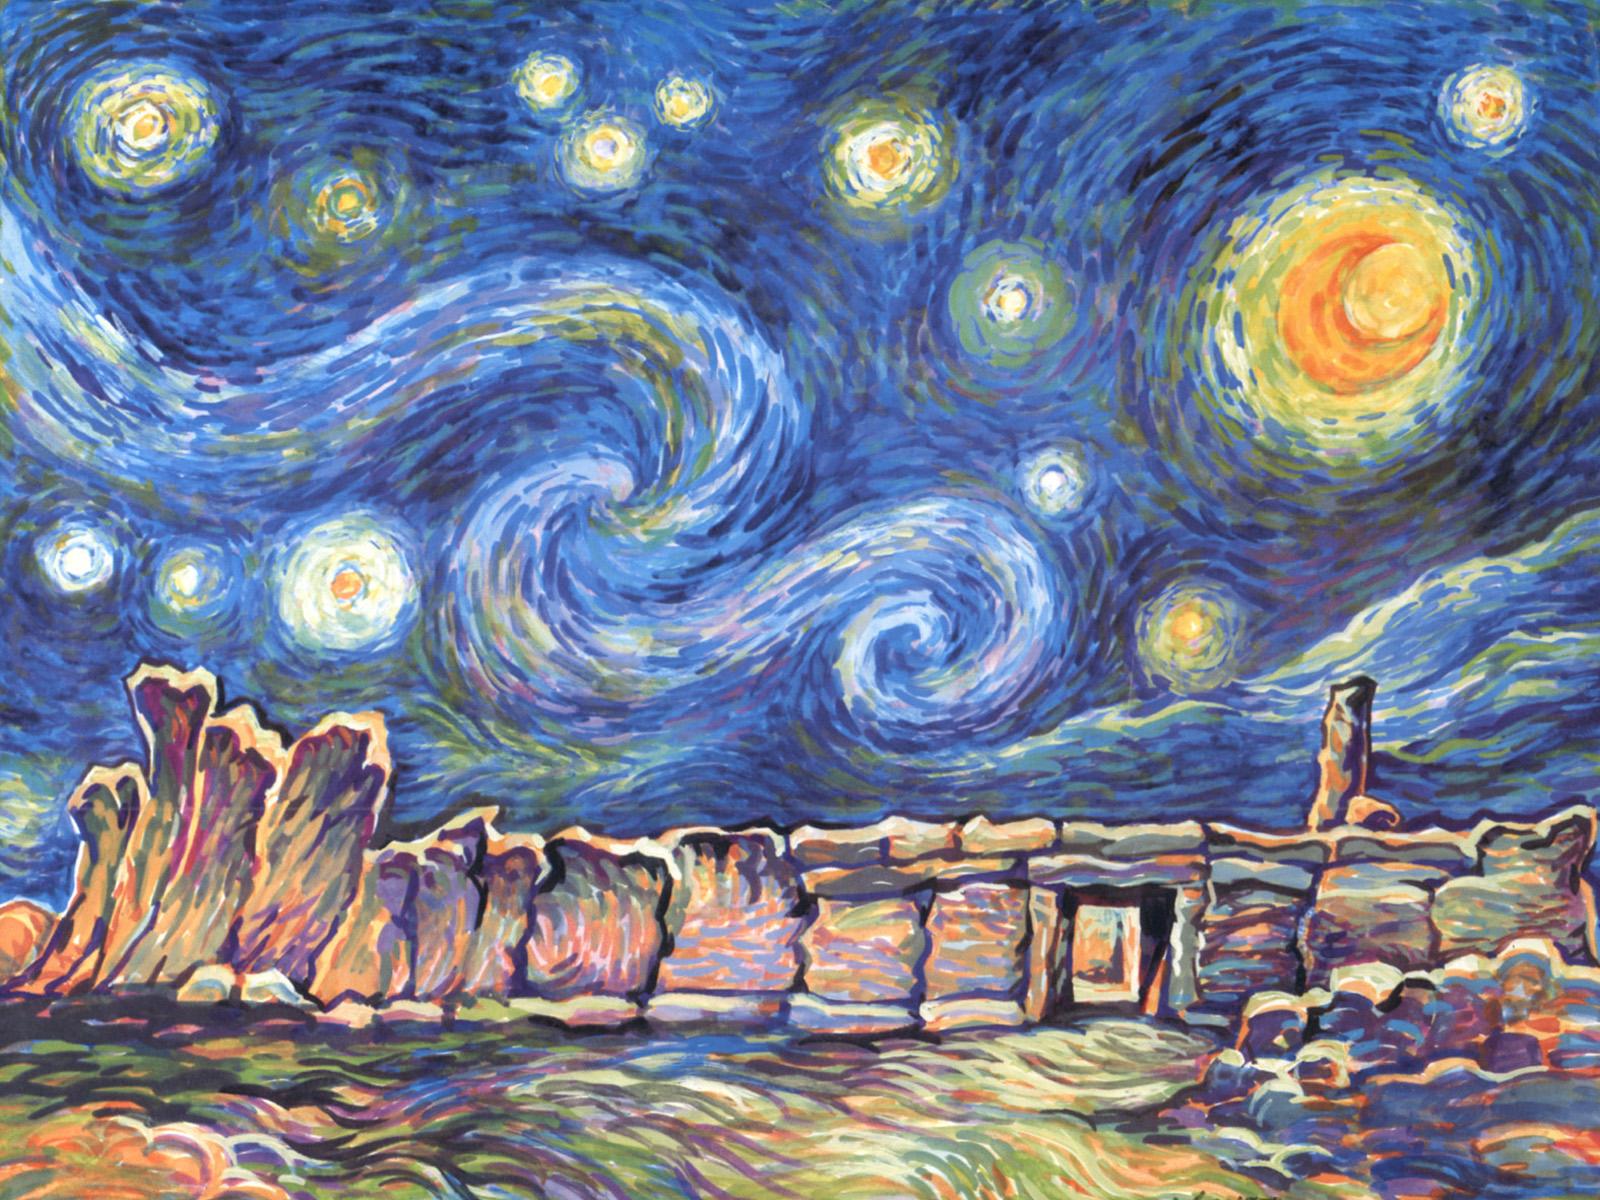 Starry Night Wallpaper | Van Gogh Wallpaper for Walls ... |Van Gogh Wallpaper Starry Night